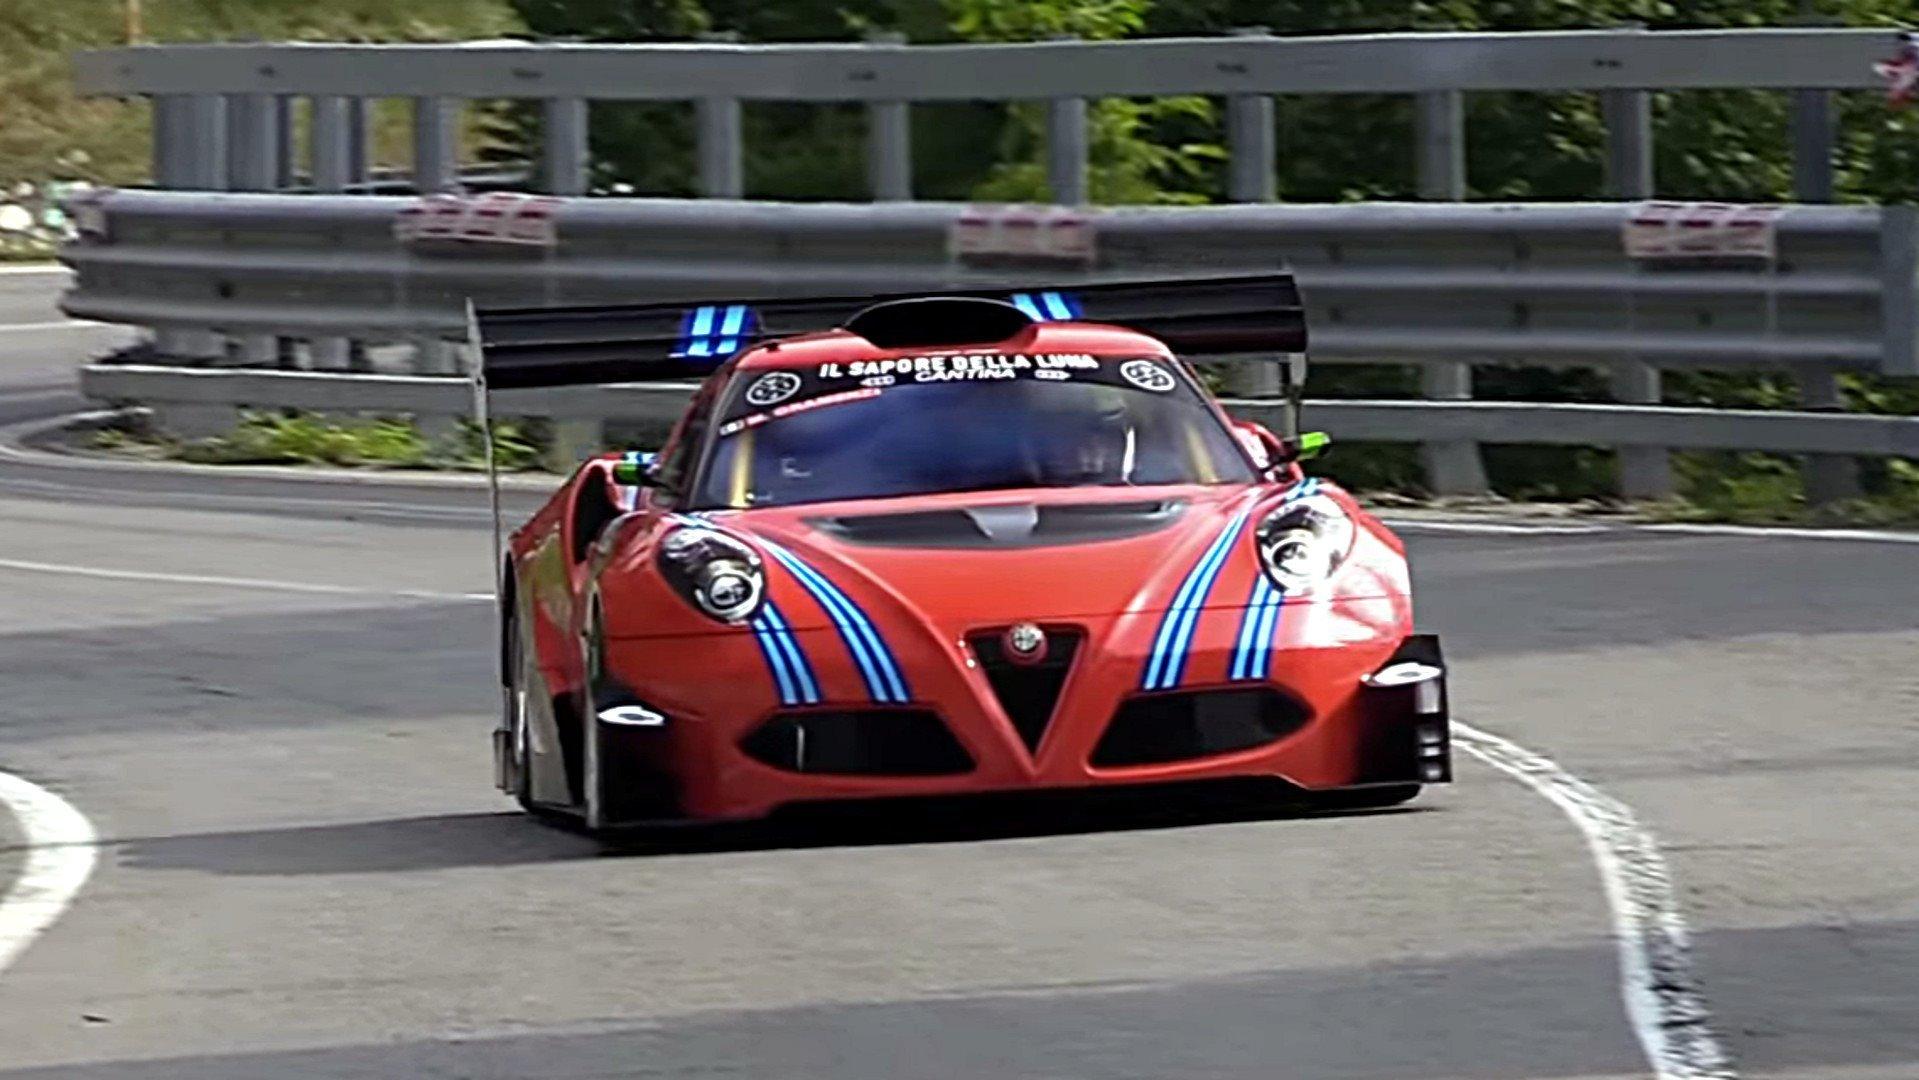 Alfa Romeo Usa Dealers | HD Cars Wallpaper